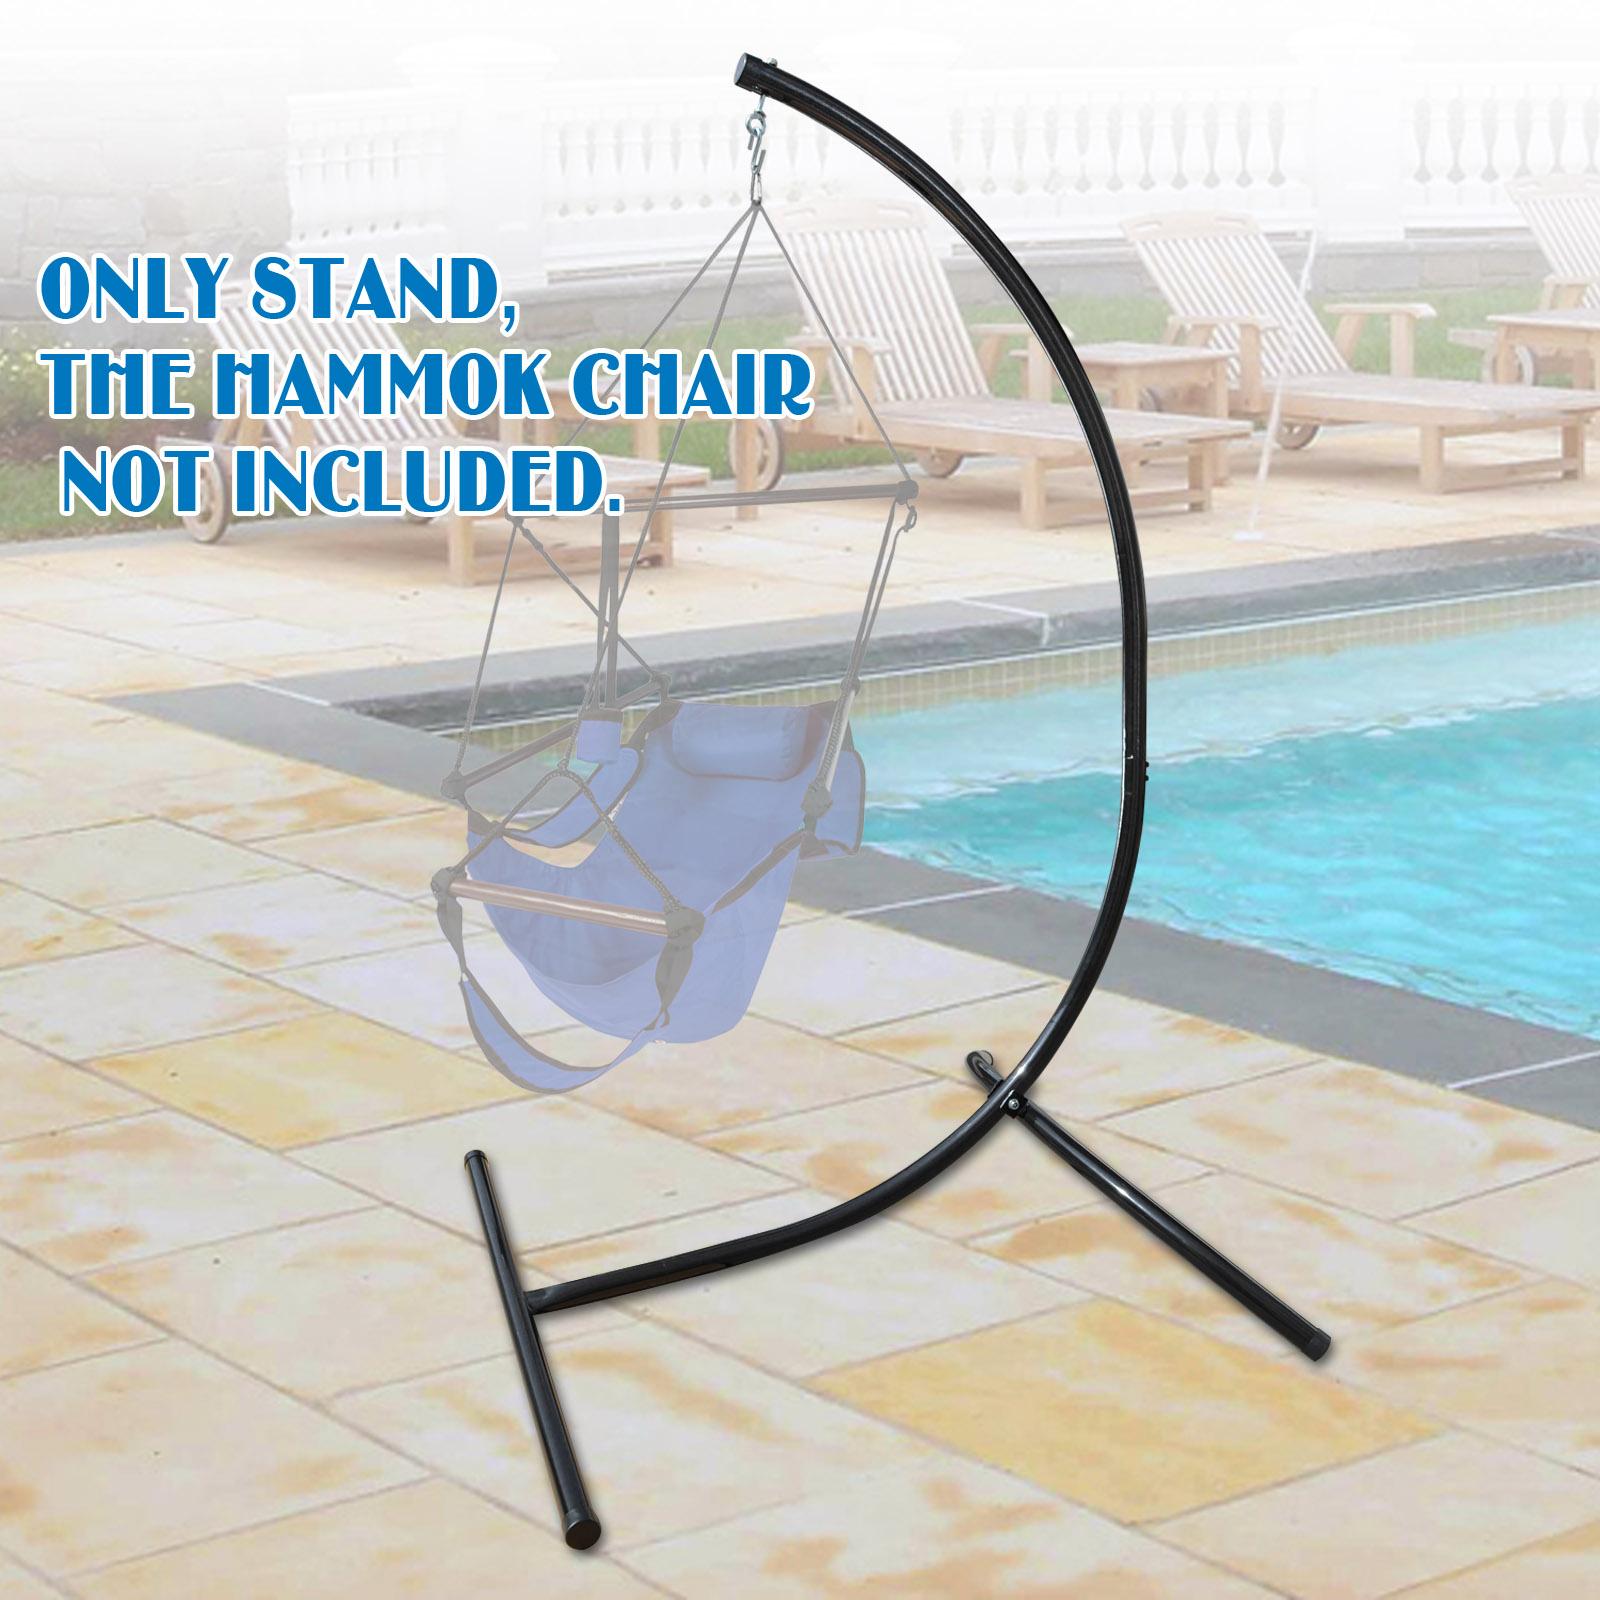 air chair frame korum fishing ebay strong camel new c stand hammock steel 440 lbs weight capacity swing holder